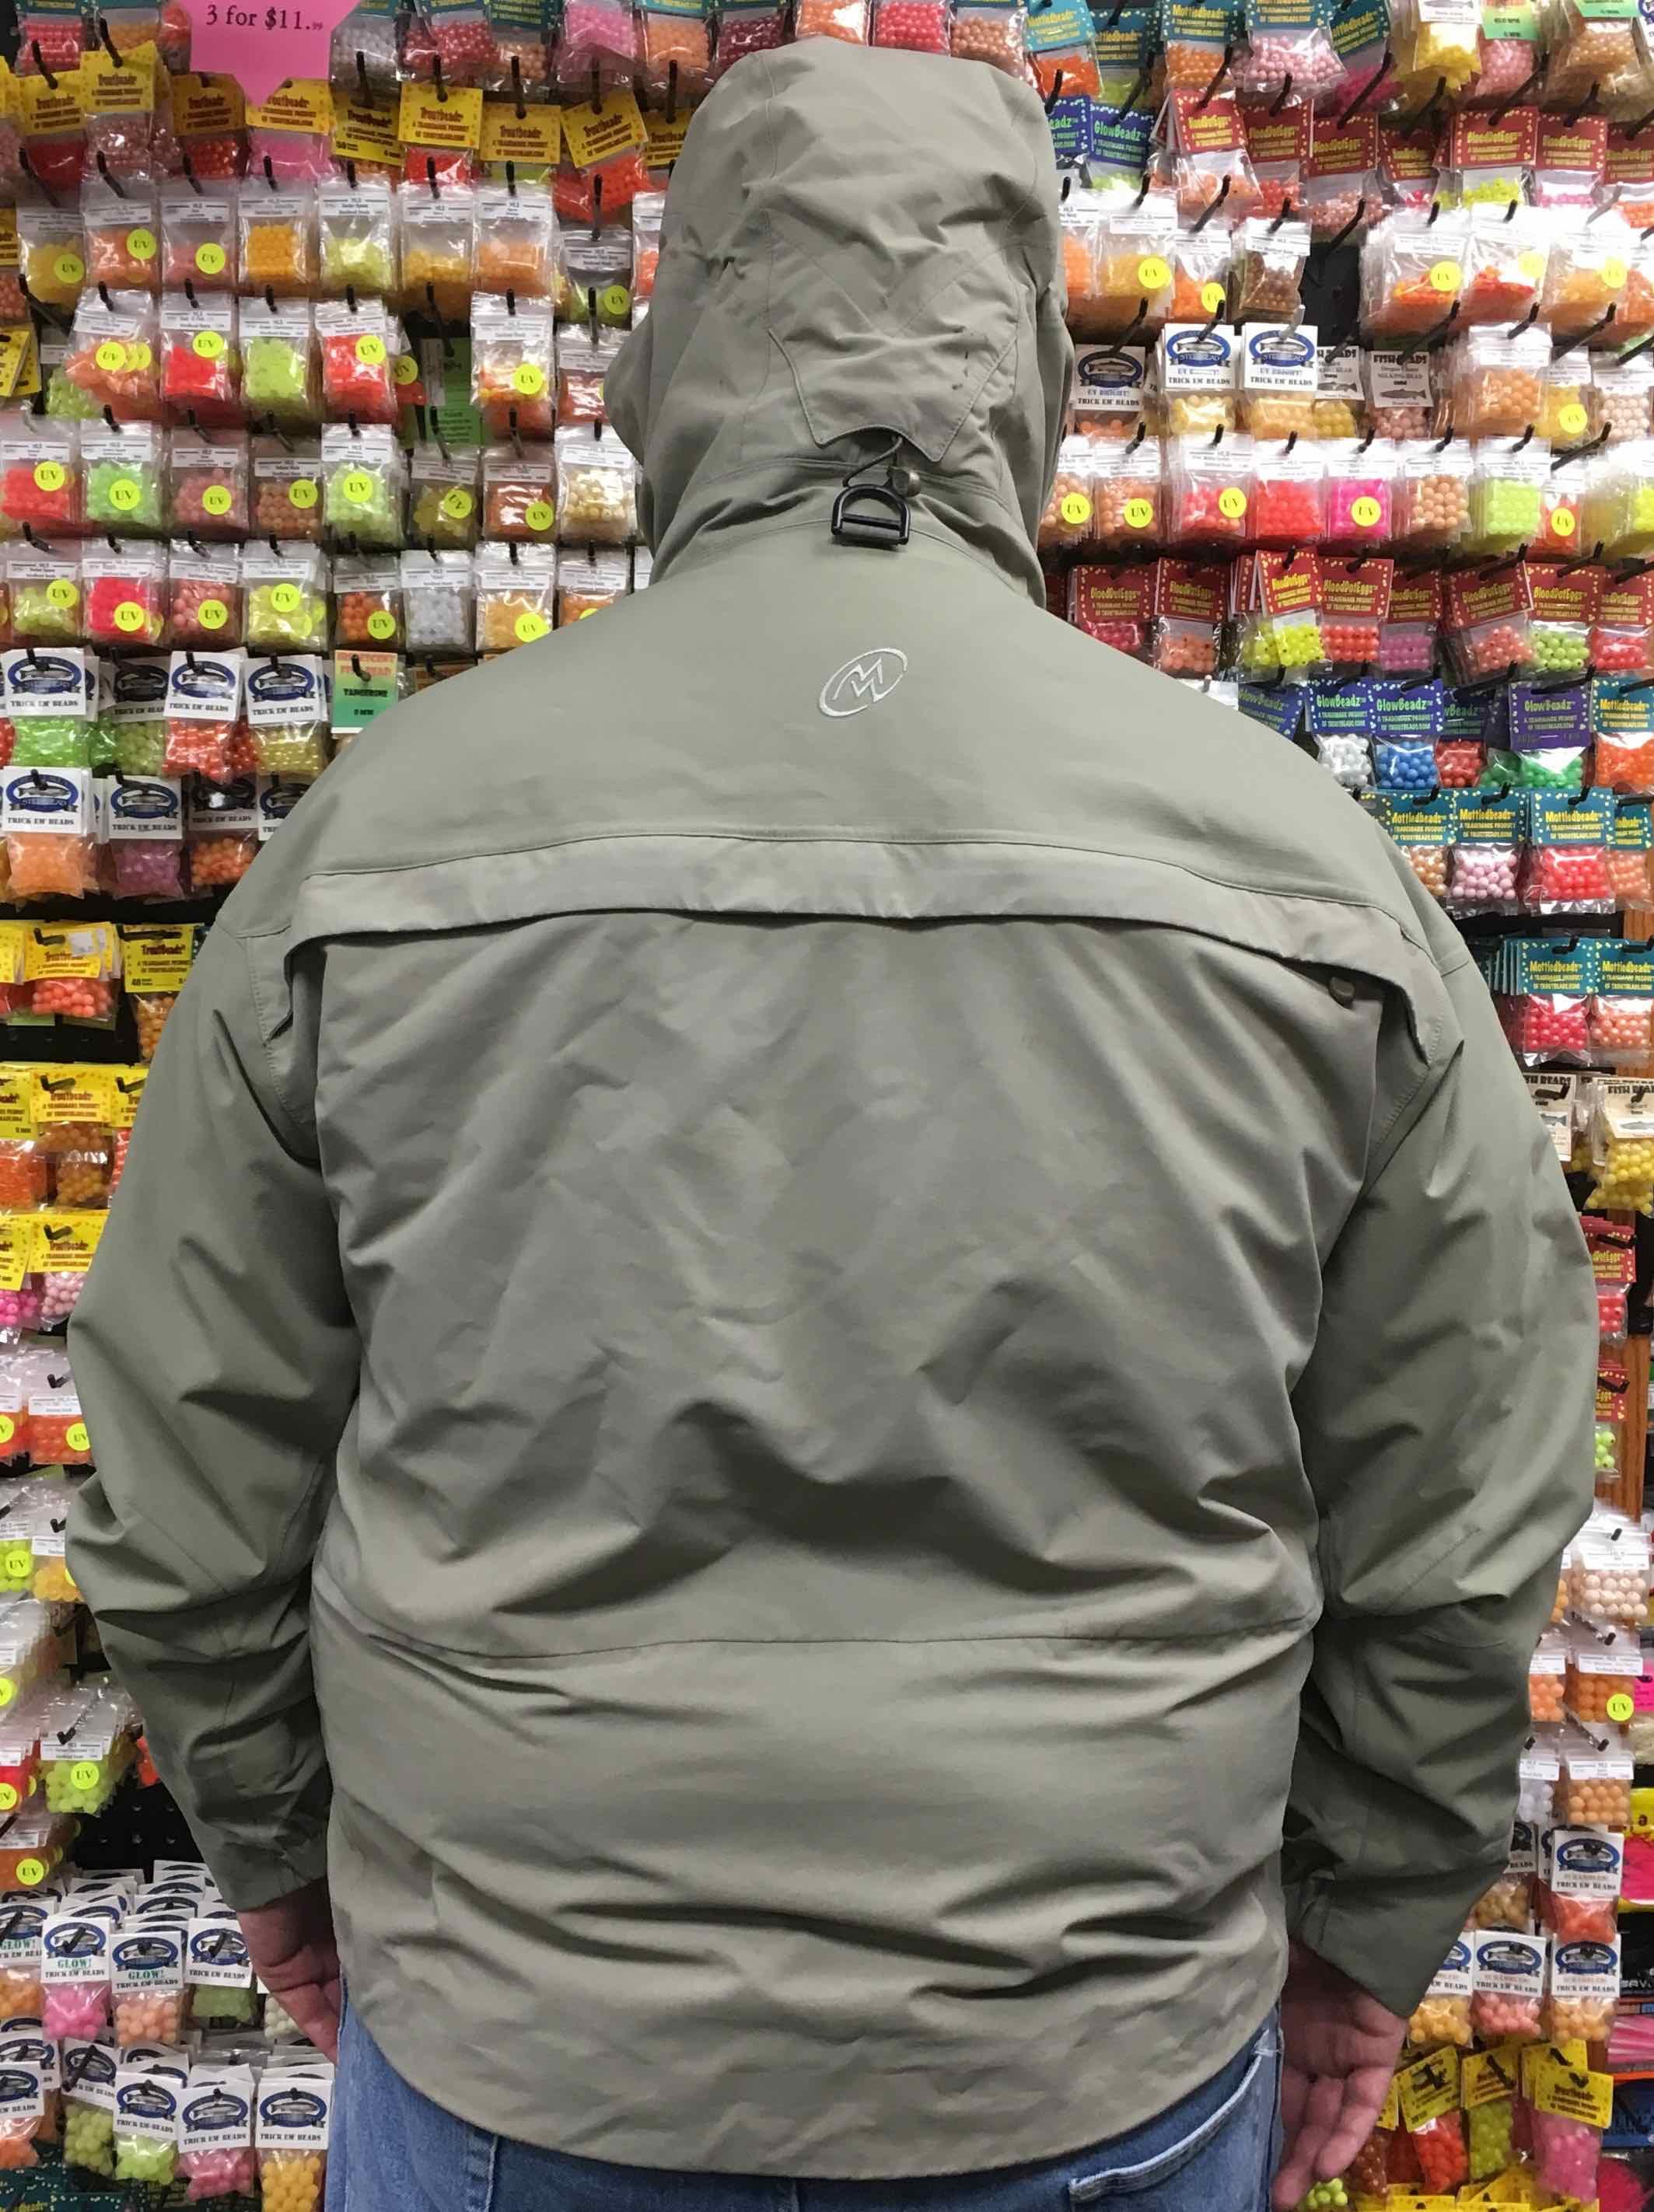 8x Pro Jacket Like Cloudveil Goretex Wading New200 Xxl Size Ibgvf6yY7